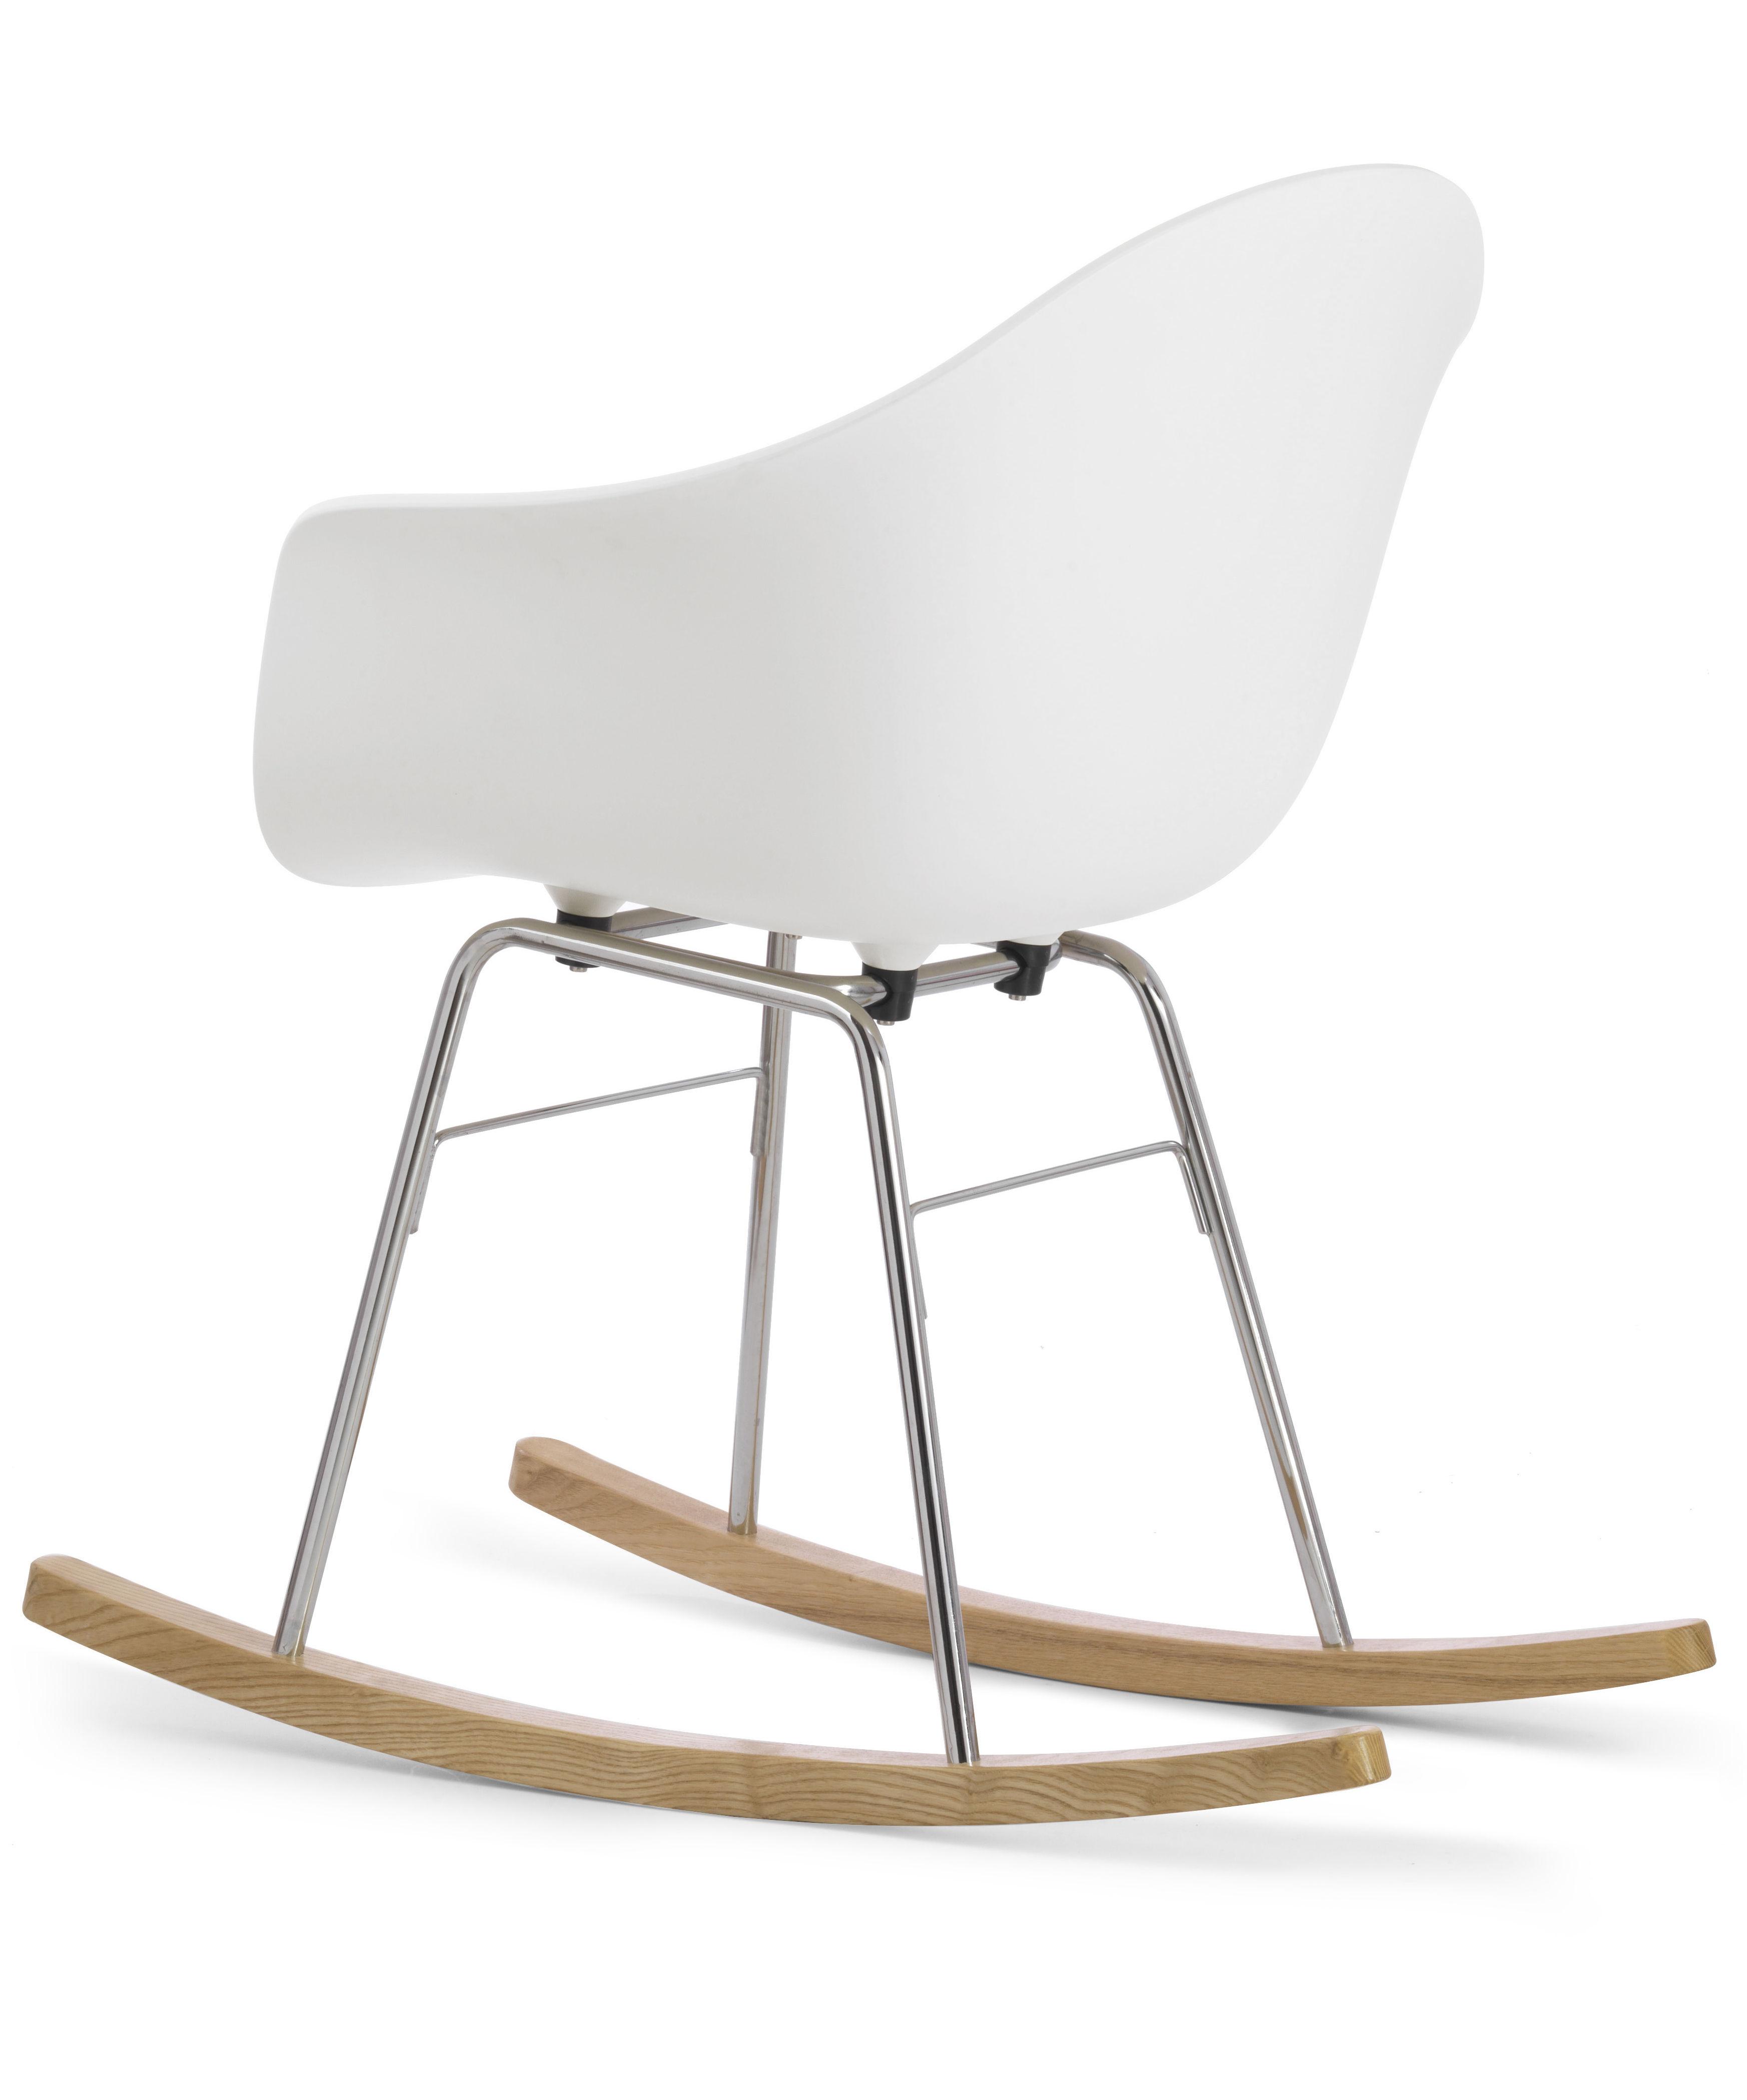 rocking chair ta patins bois blanc chrom patins bois toou made in design. Black Bedroom Furniture Sets. Home Design Ideas